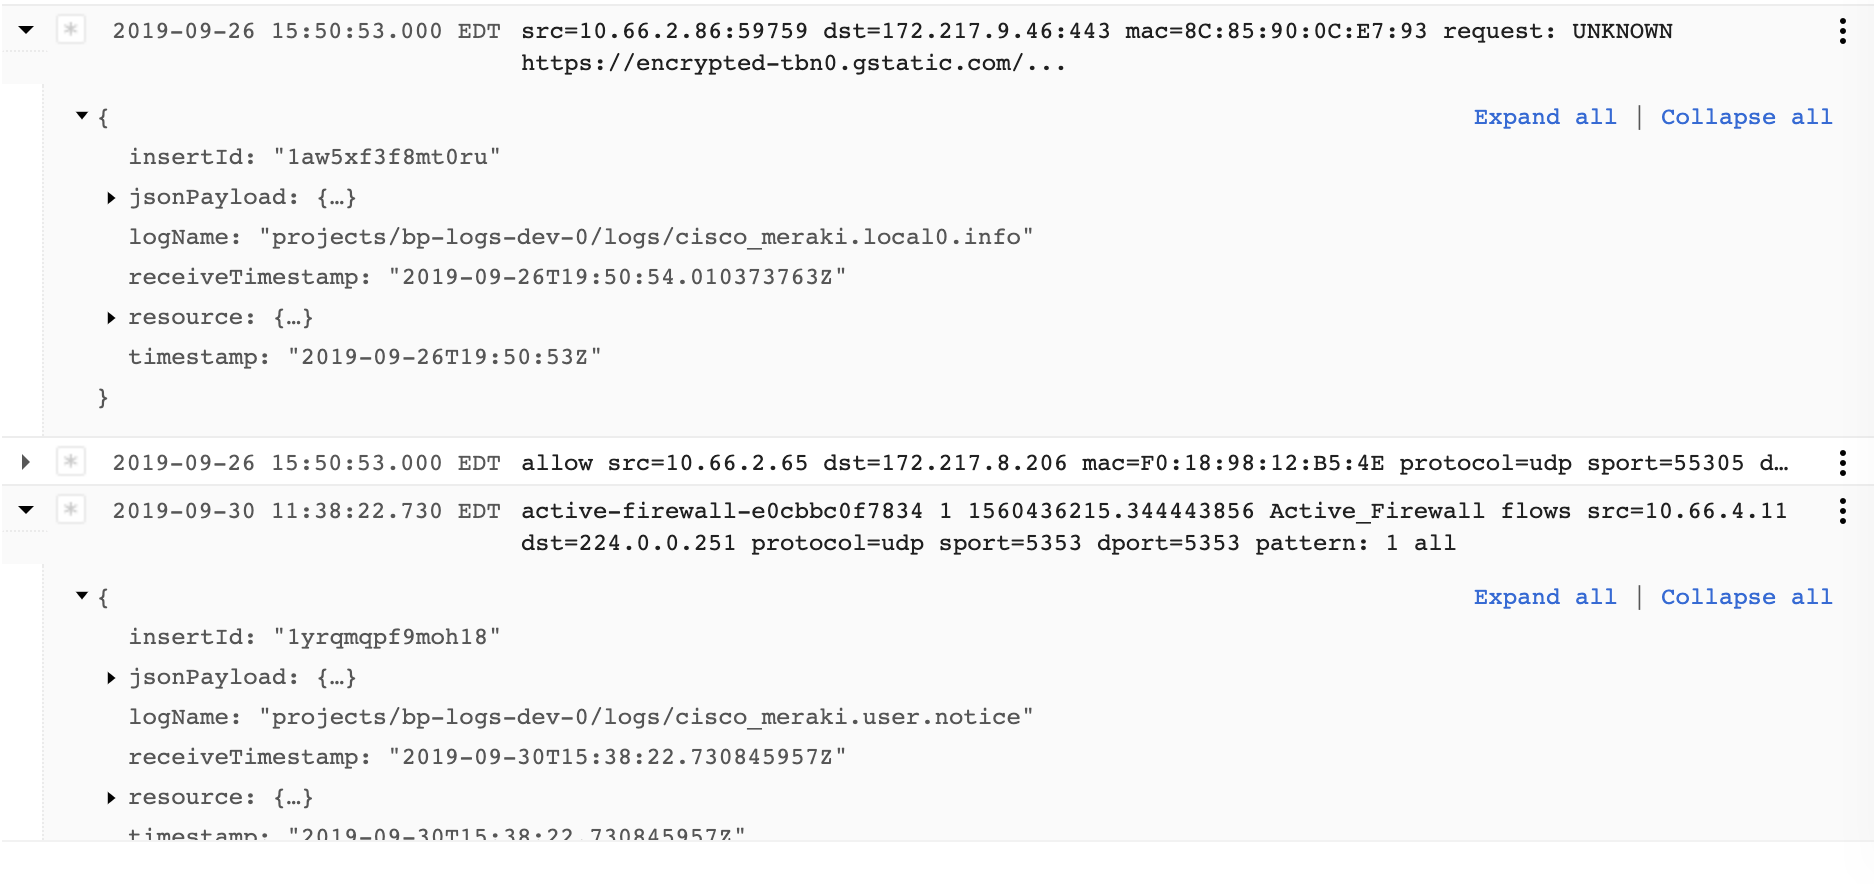 Cisco Meraki logs example